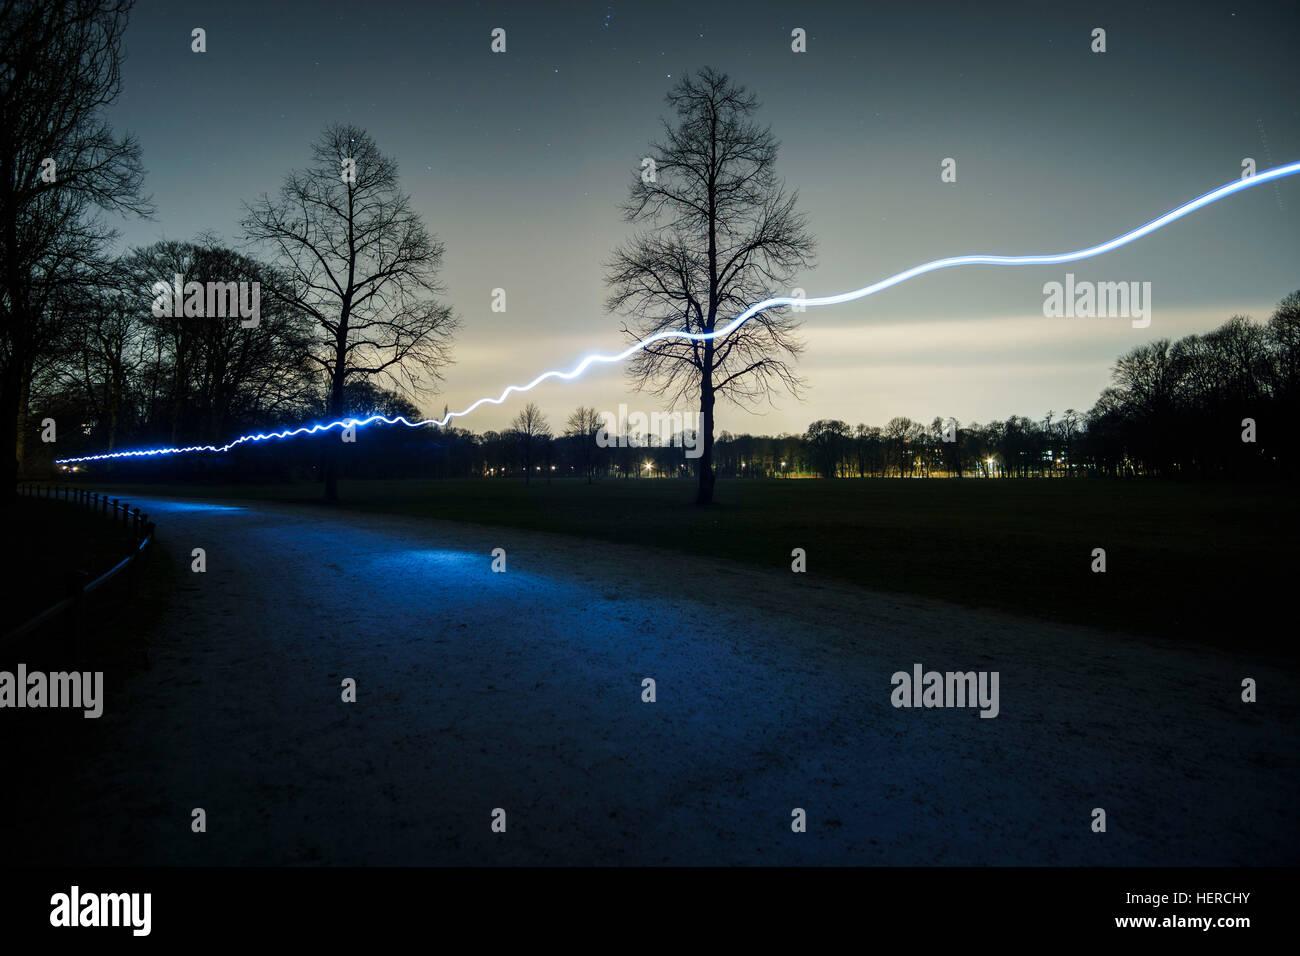 bulb exposure of a jogger with headlamp, Englischer Garten / English Garden, Munich, Bavaria, Germany - Stock Image